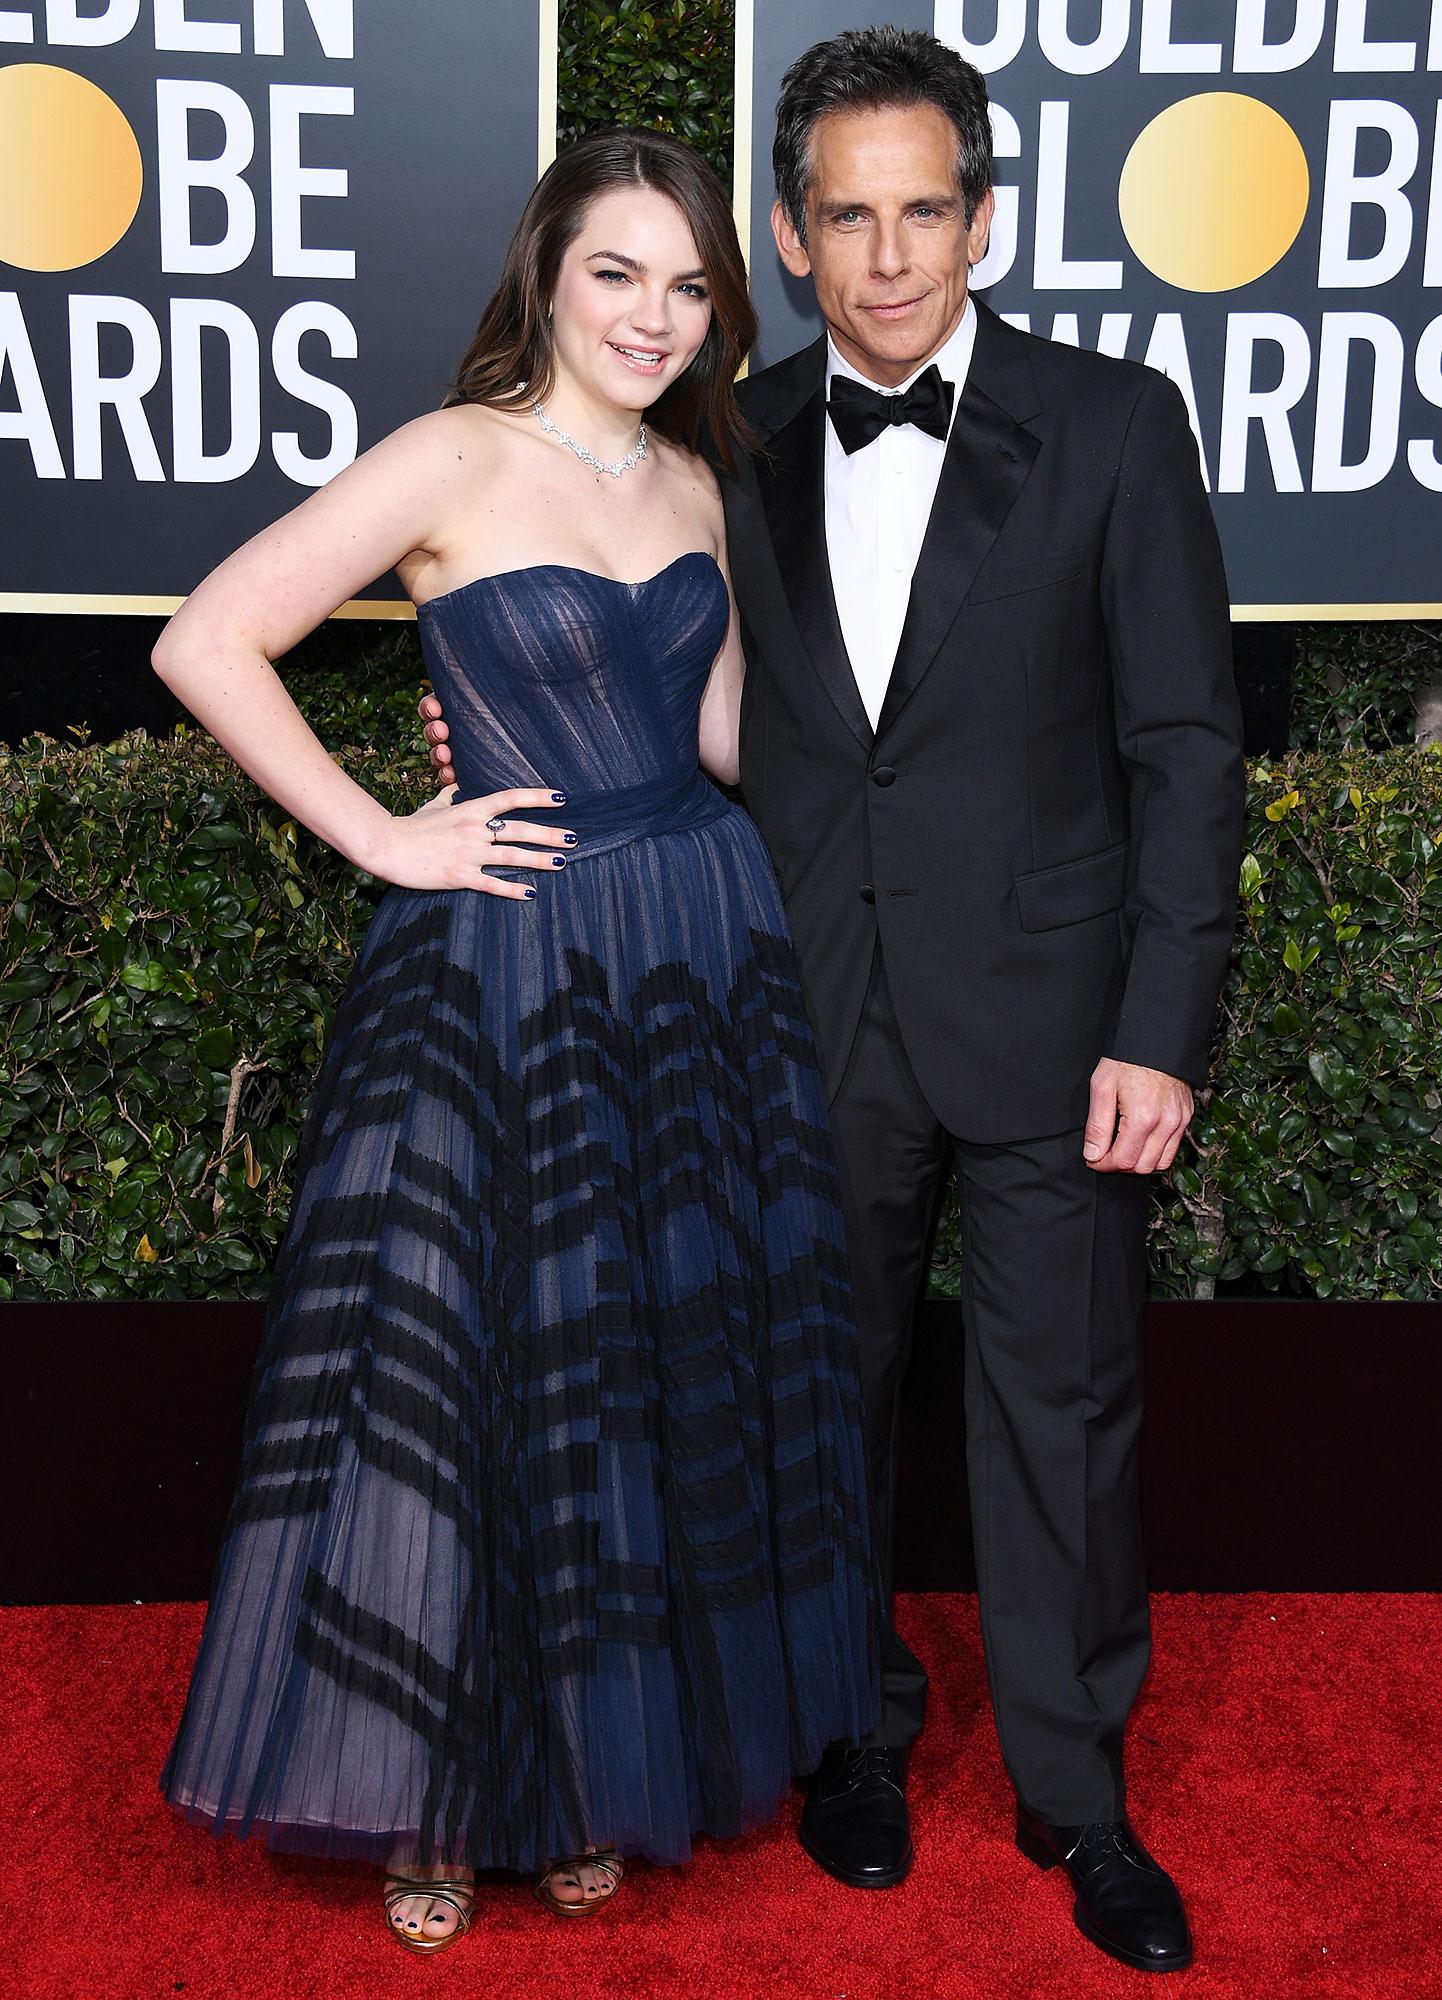 Ben Stiller Daughter Ella Golden Globes 2019